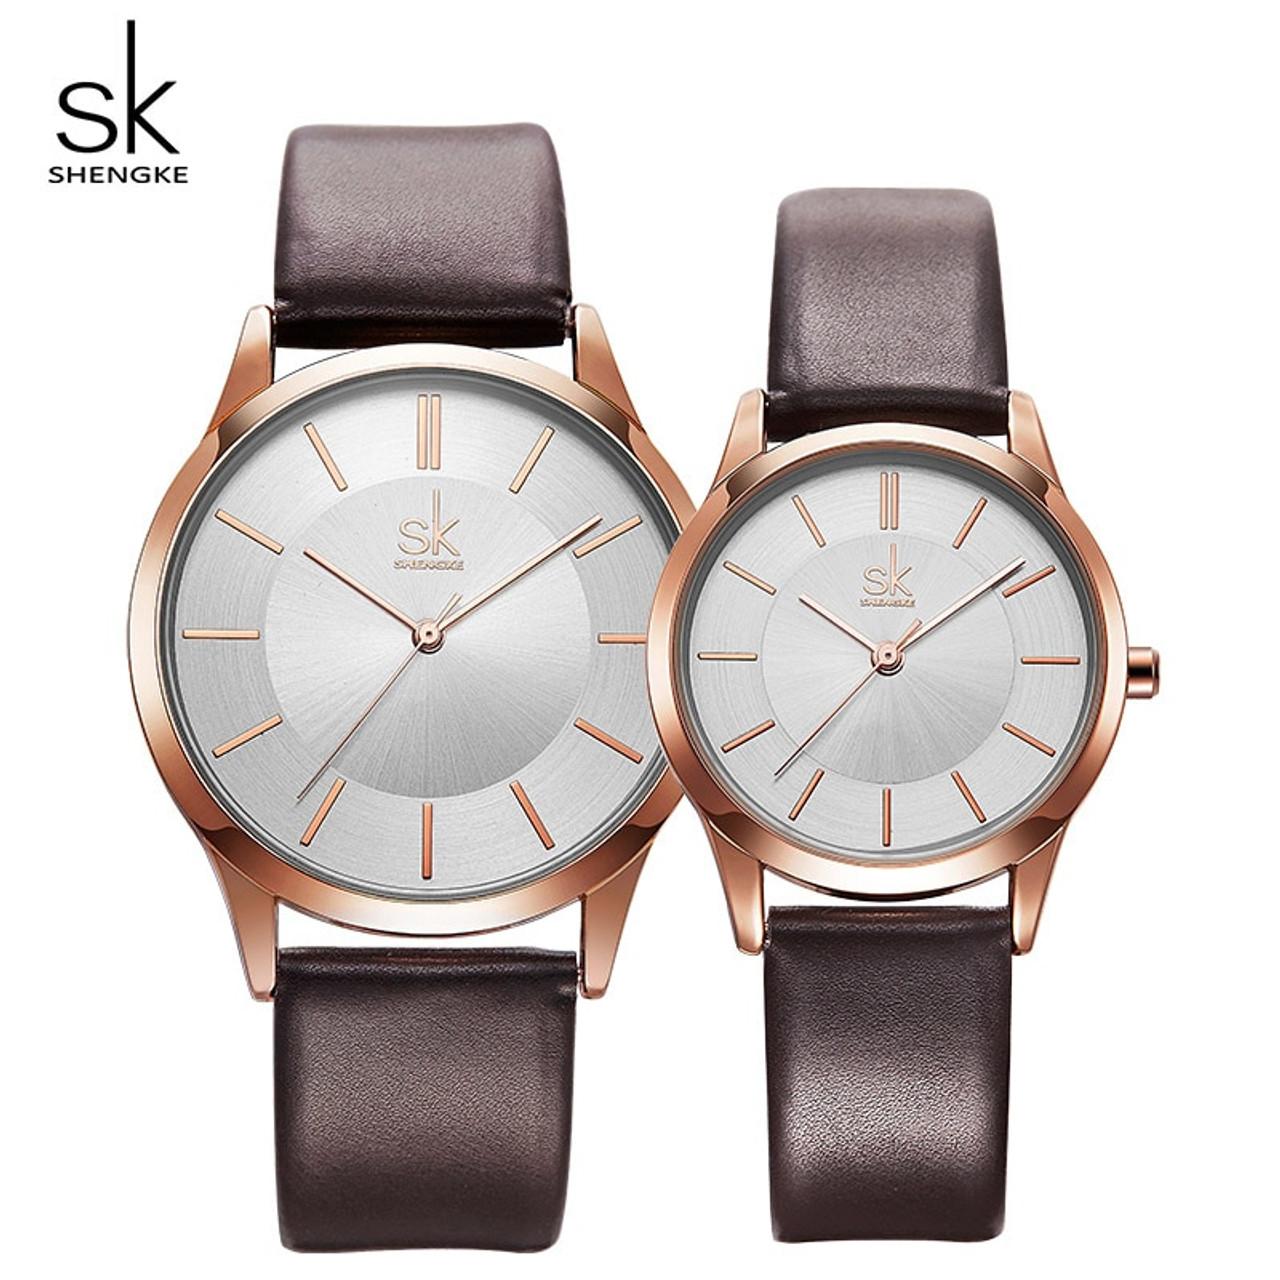 92f5001b07cd ... Shengke New Fashion Leather Strap Women Men Couple Watches Luxury Quartz  Female Male Wrist Watch 2018 ...